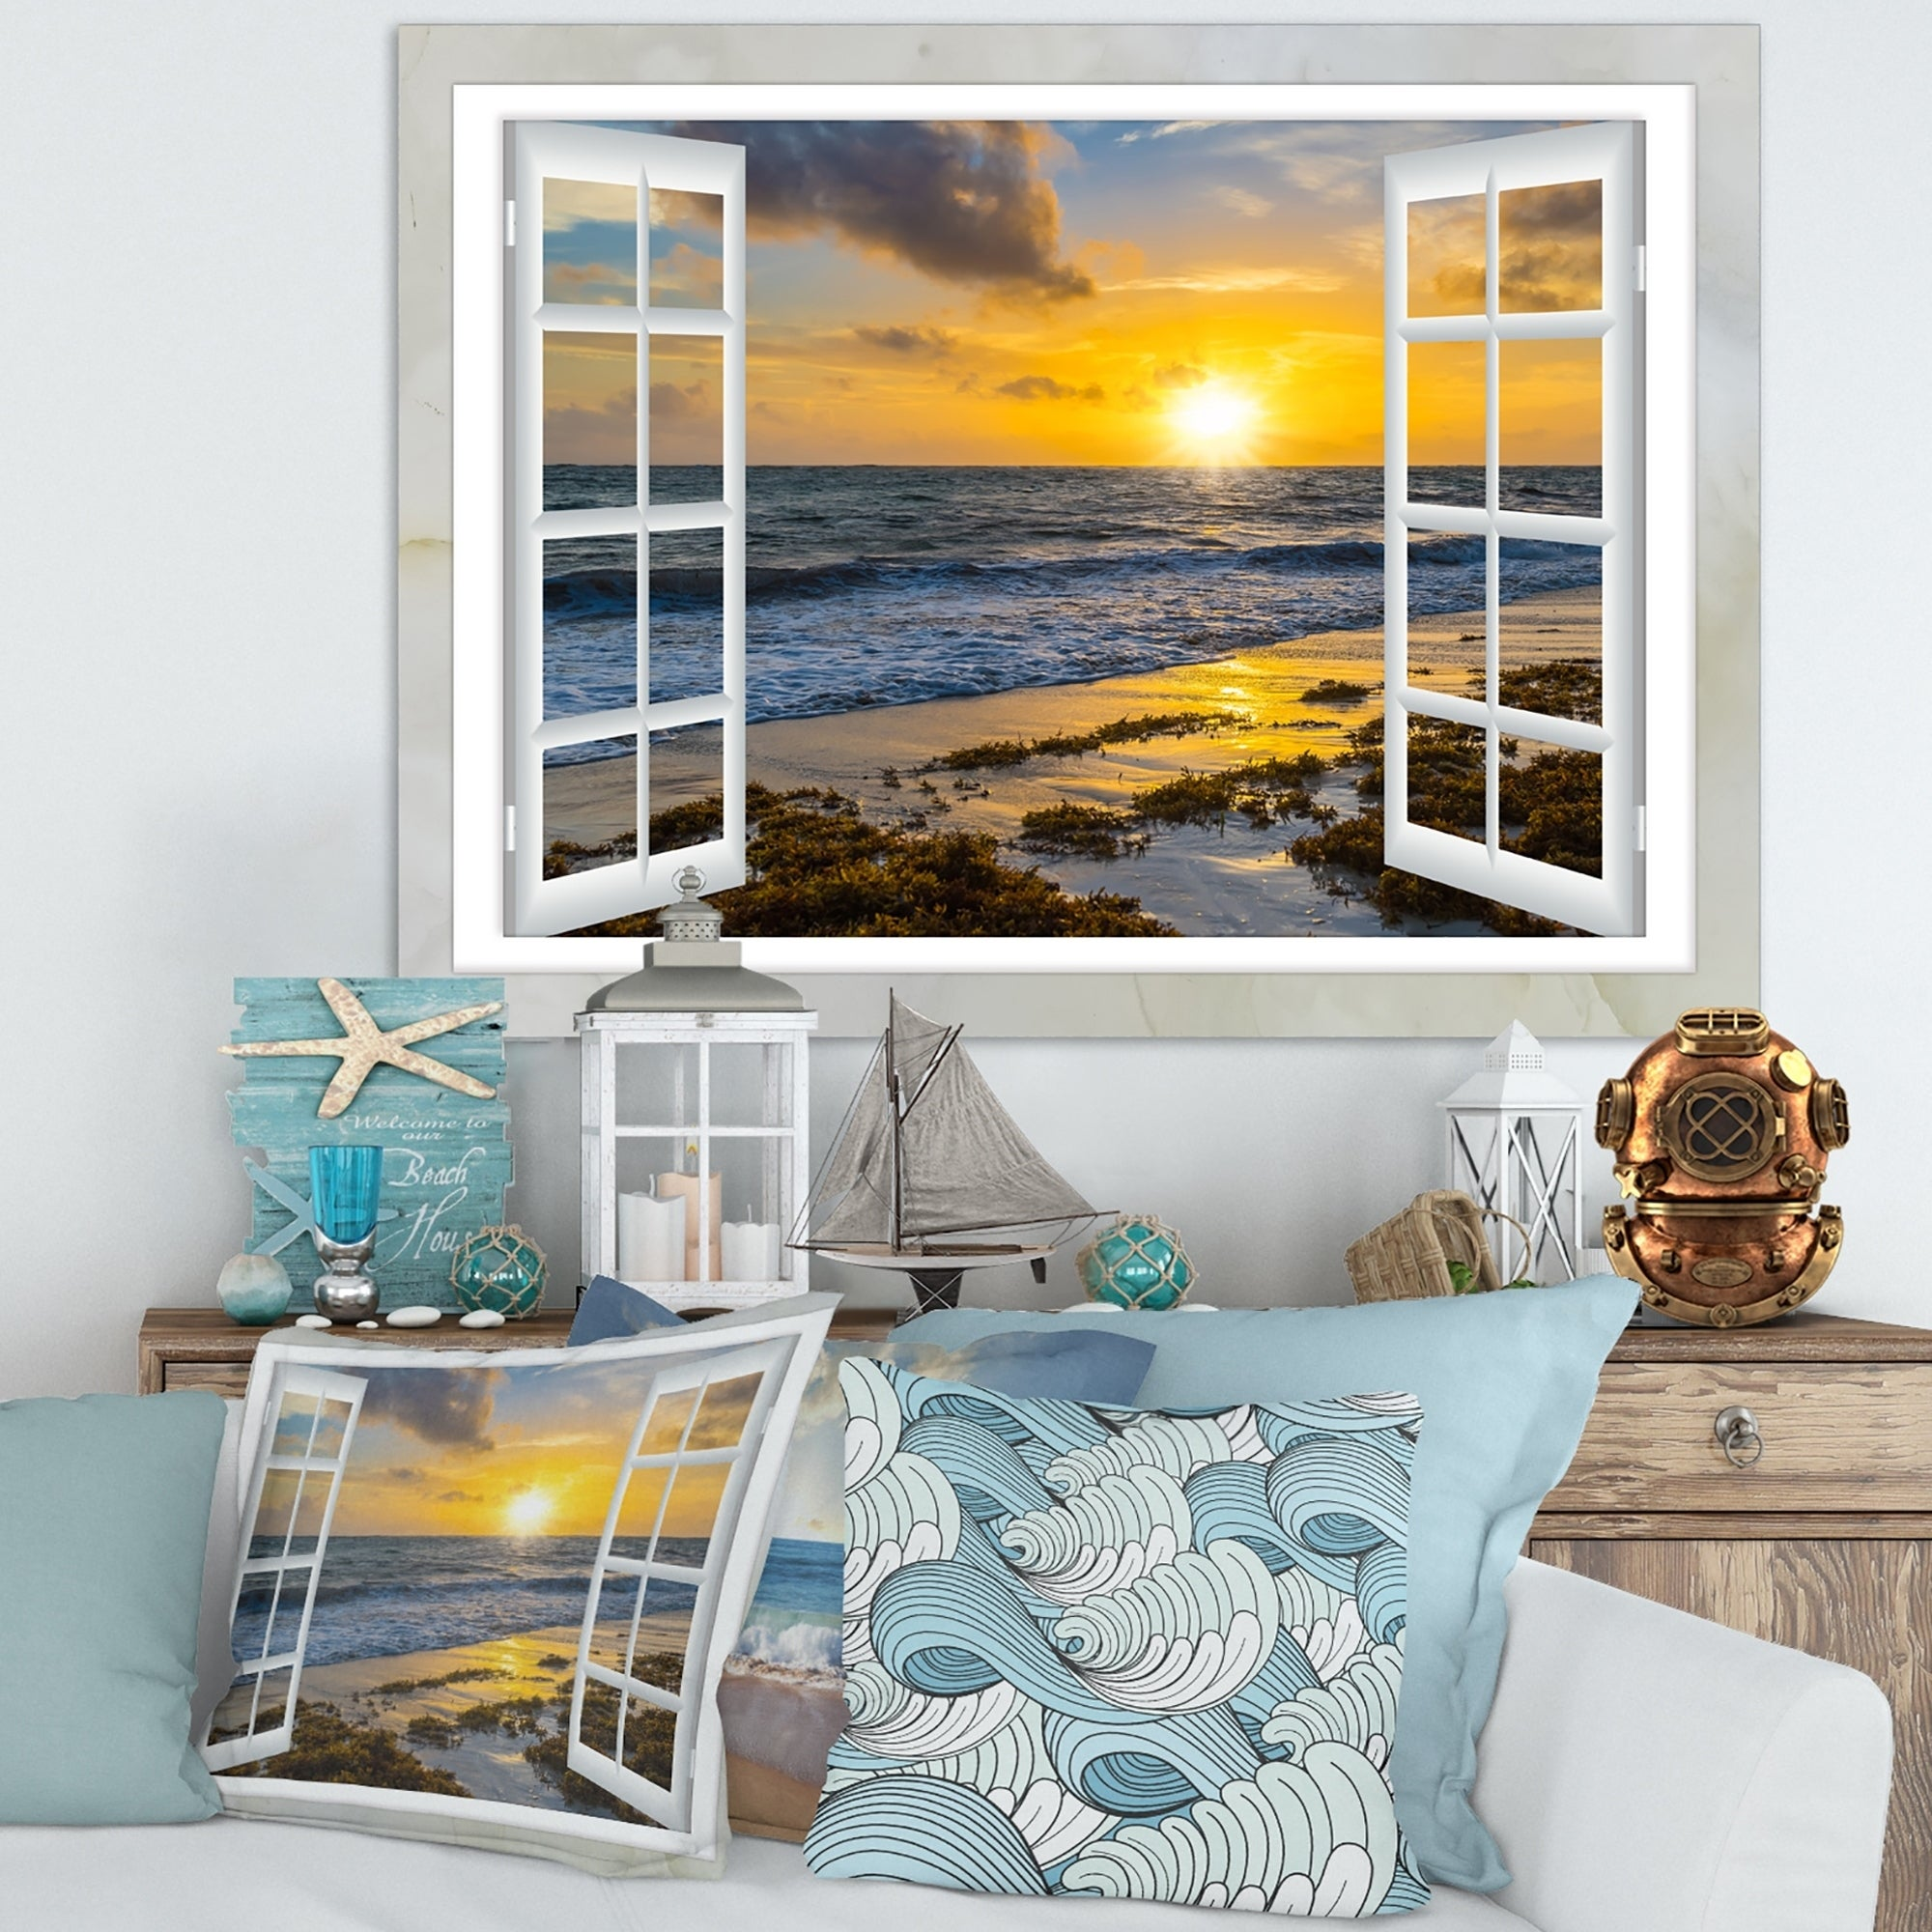 3D Window Effect on Canvas Open Bay Seascape Light Dim Picture Wall Art Print